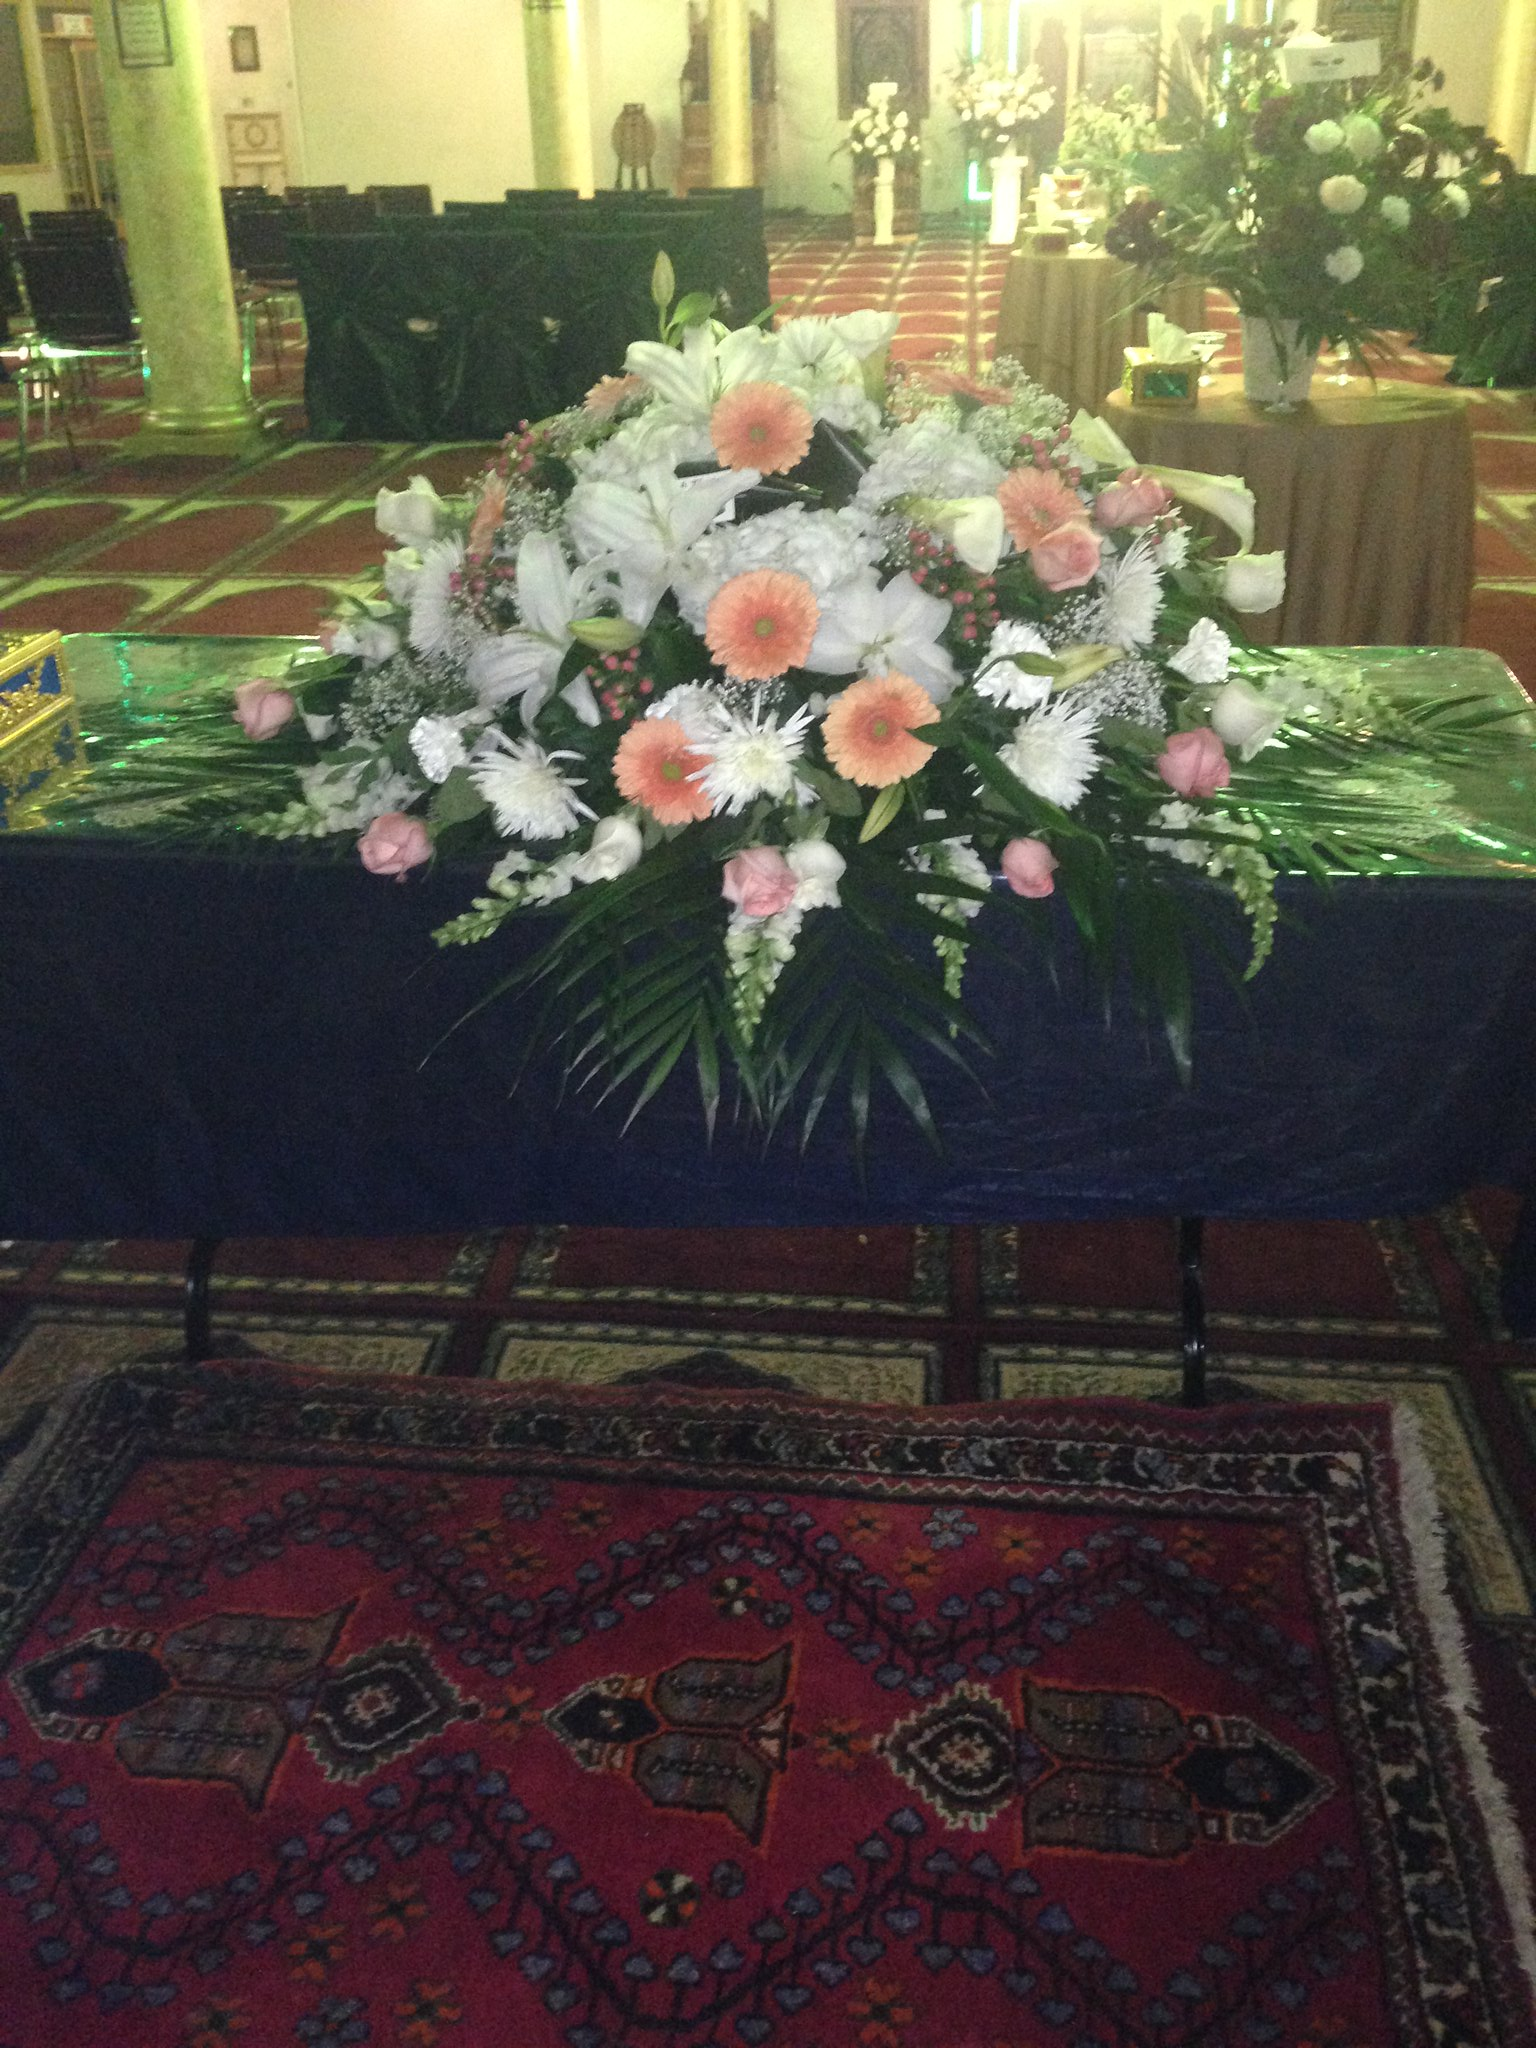 Funeral cascat$350